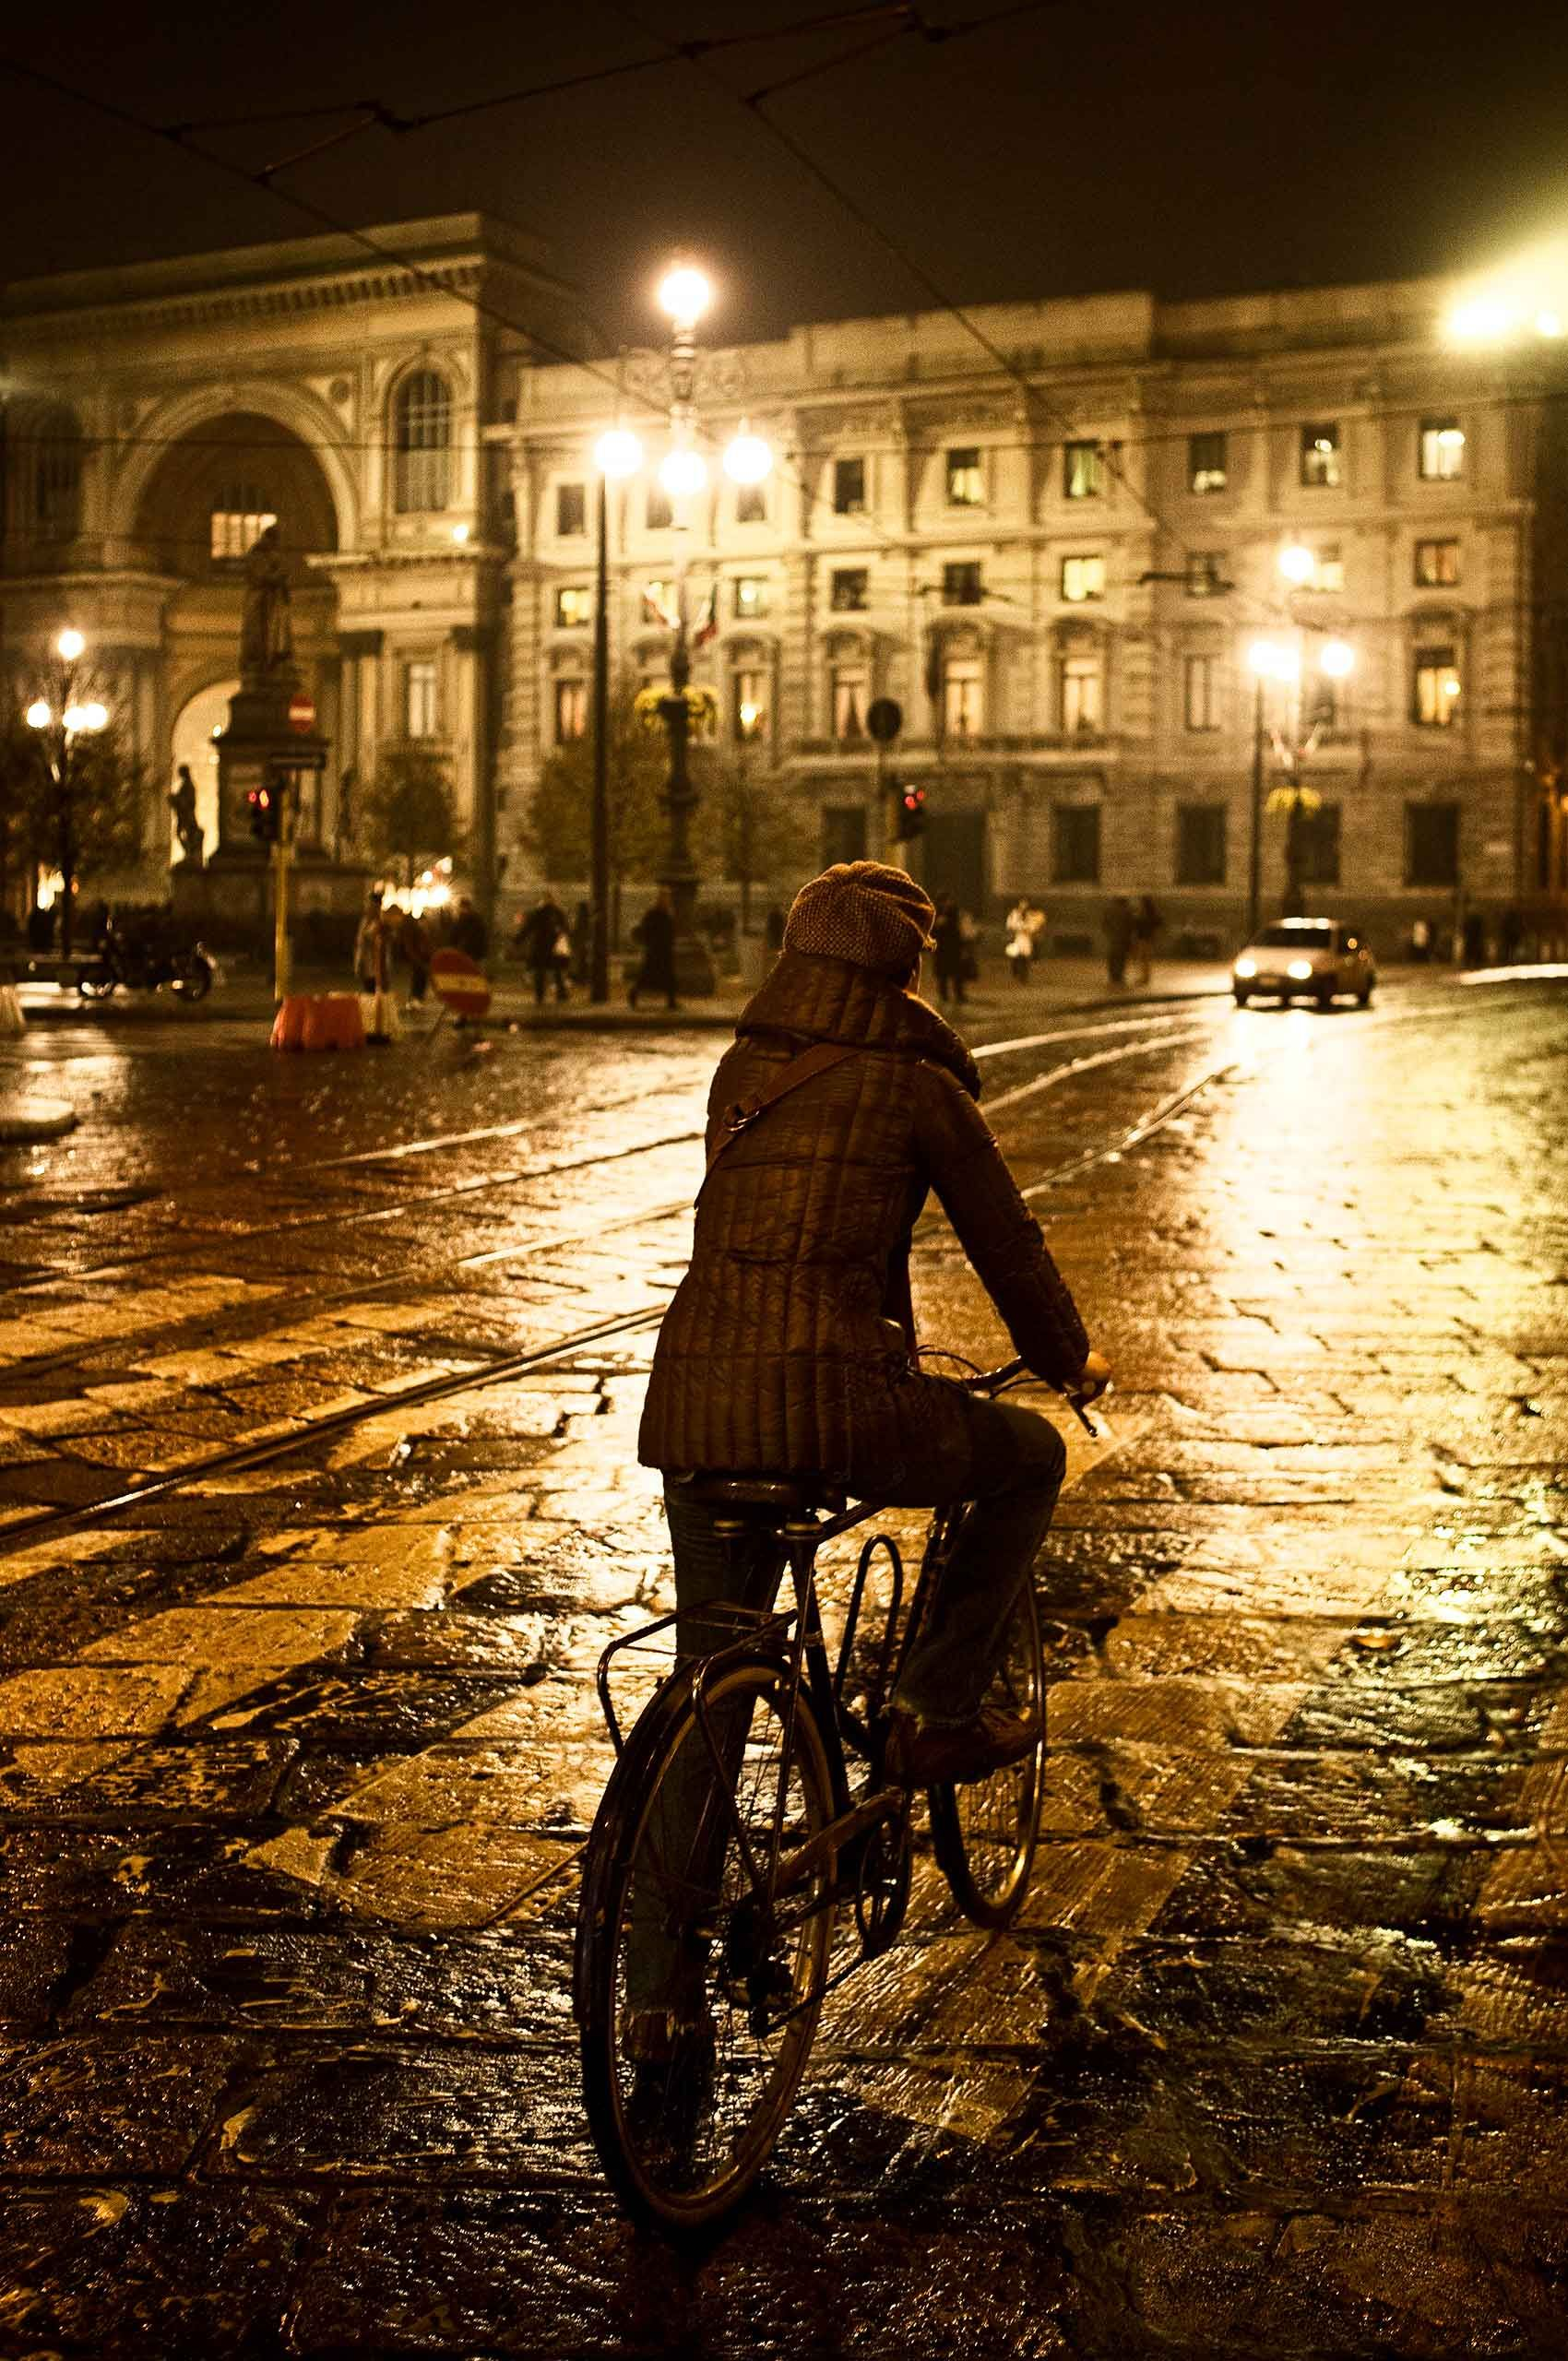 woman-on-bicycle-milano-by-henrikolundphotography.jpg